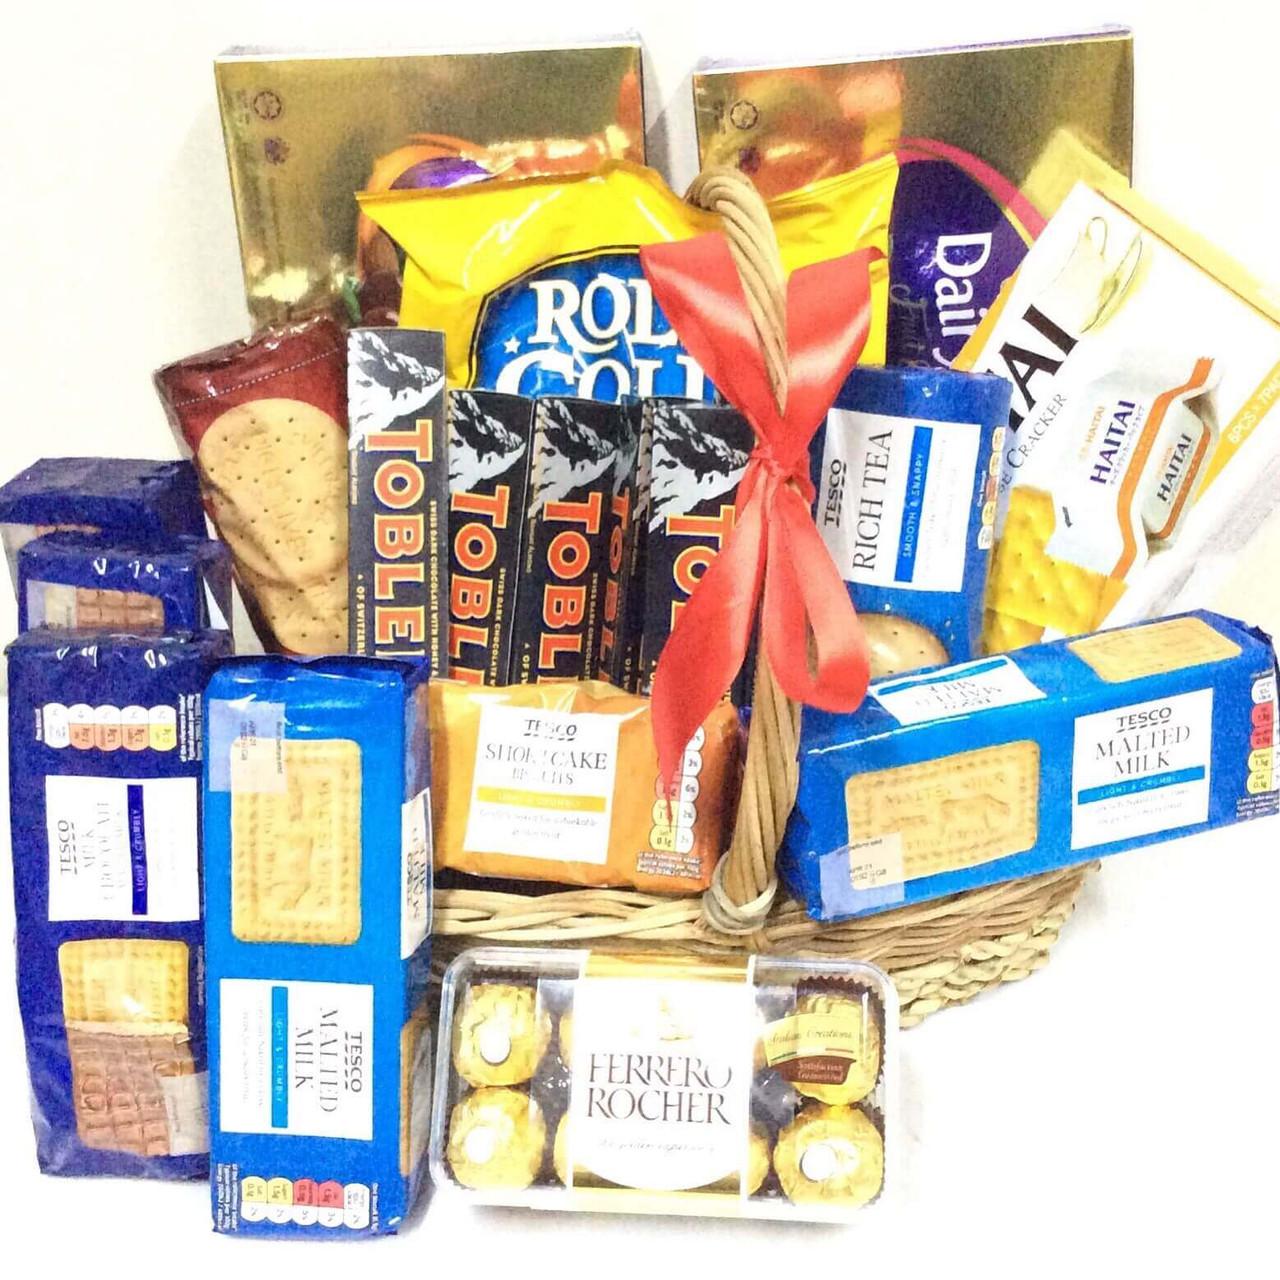 Chocolate Snacks & Cookies Overload Basket